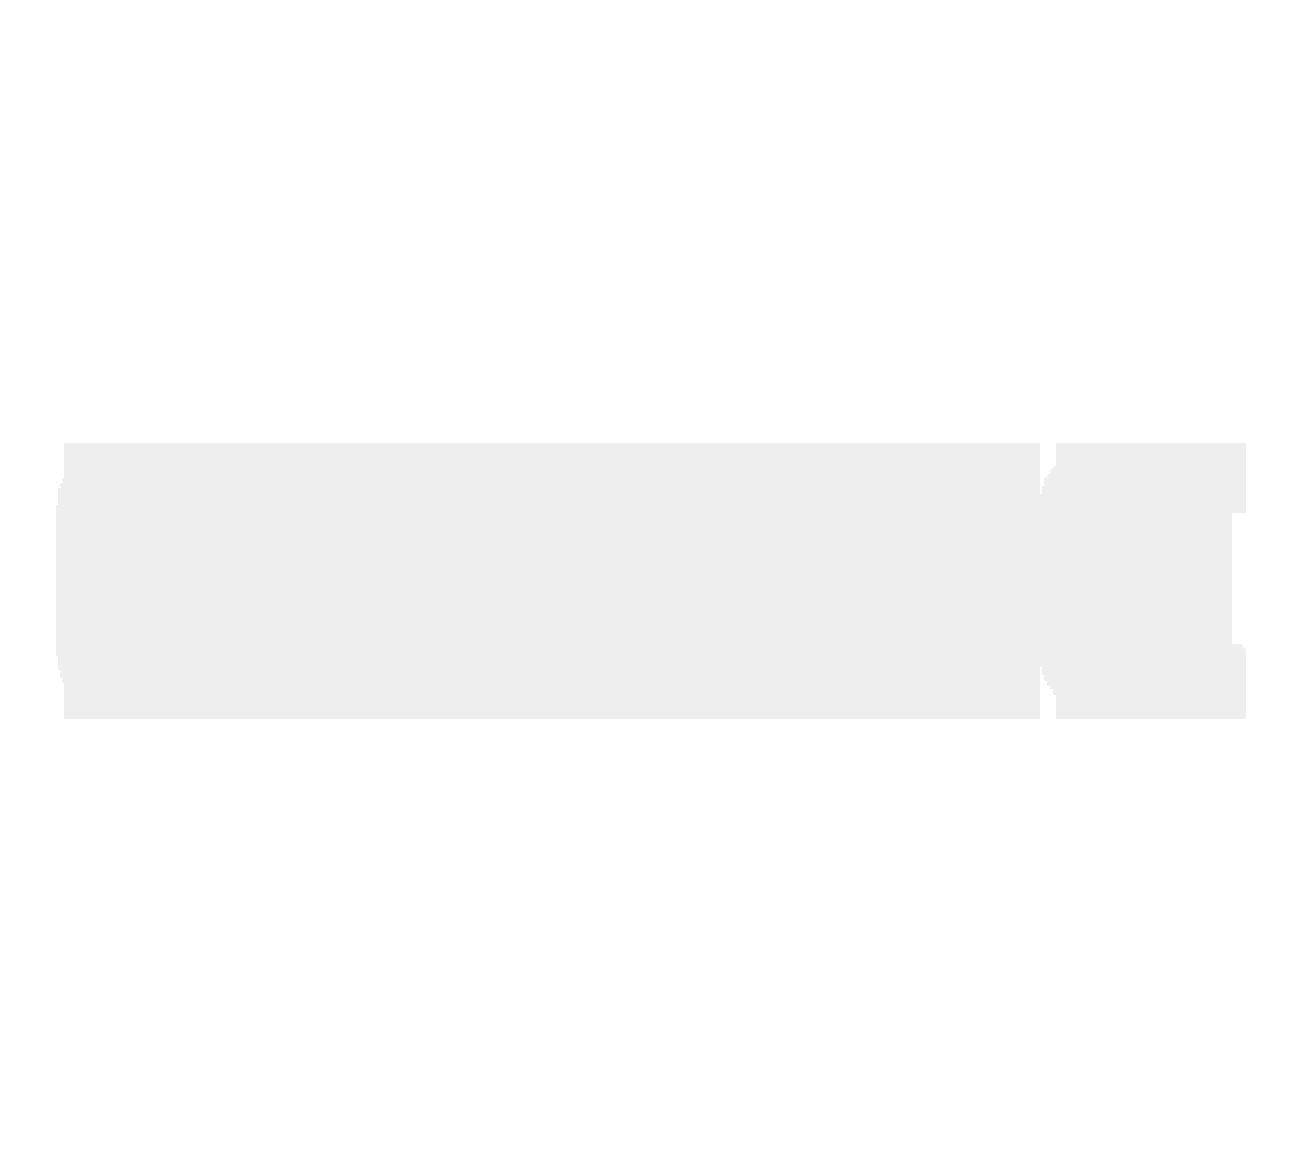 OOASCC2